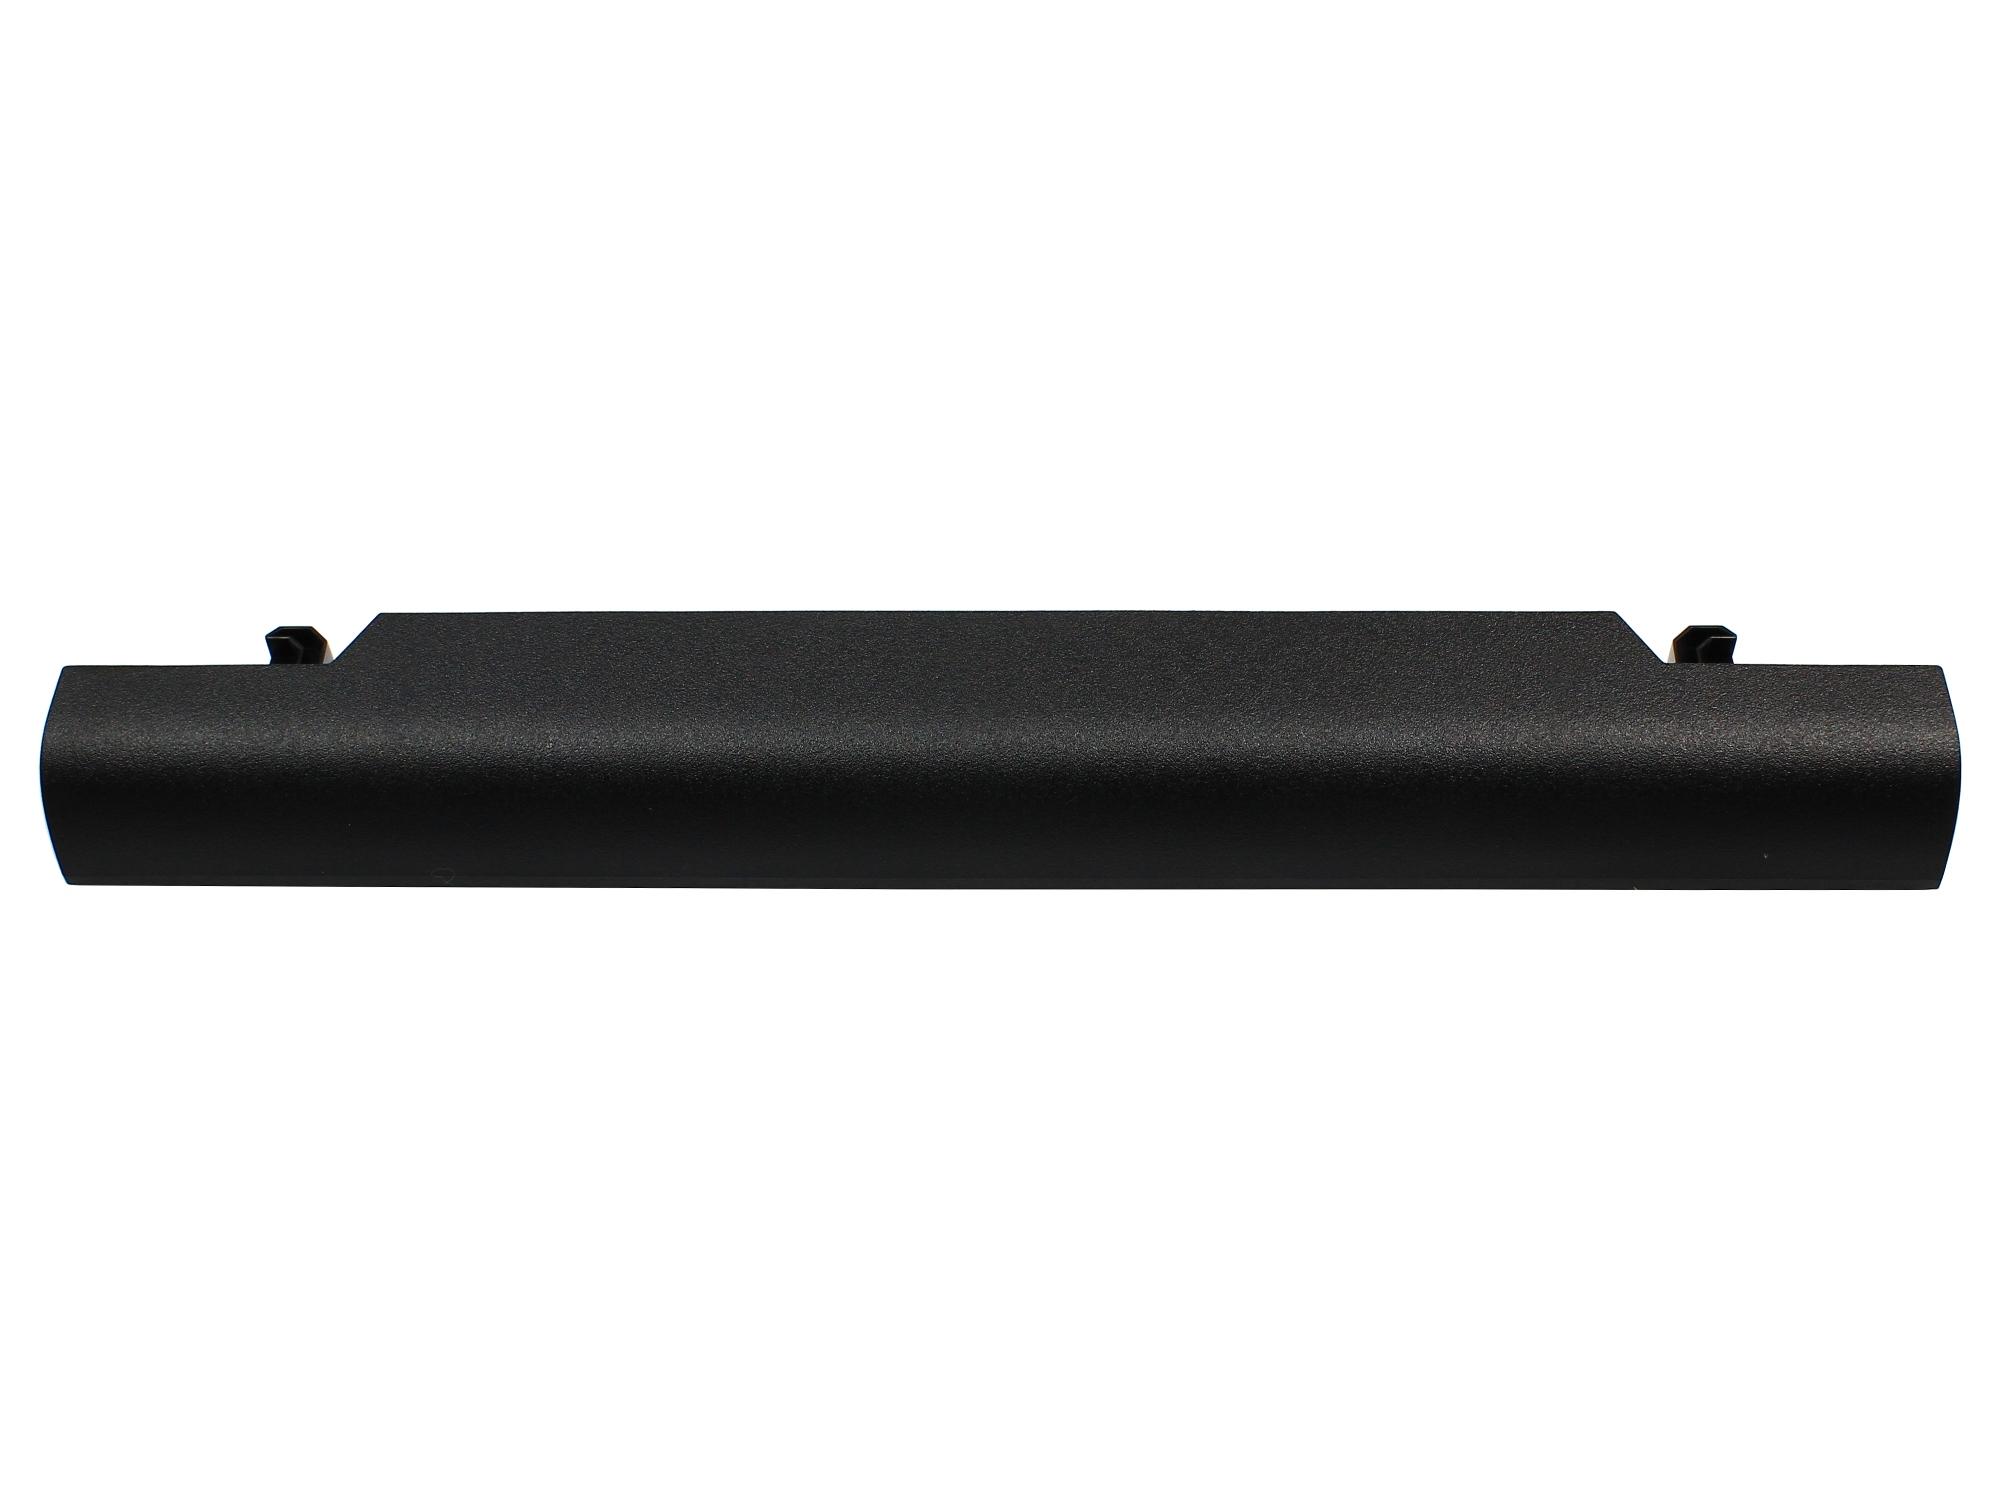 Baterie compatibila Asus ROG GL552JX, GL552VL, GL552VW, GL552VX, 15V, 2200mAh, 33Wh